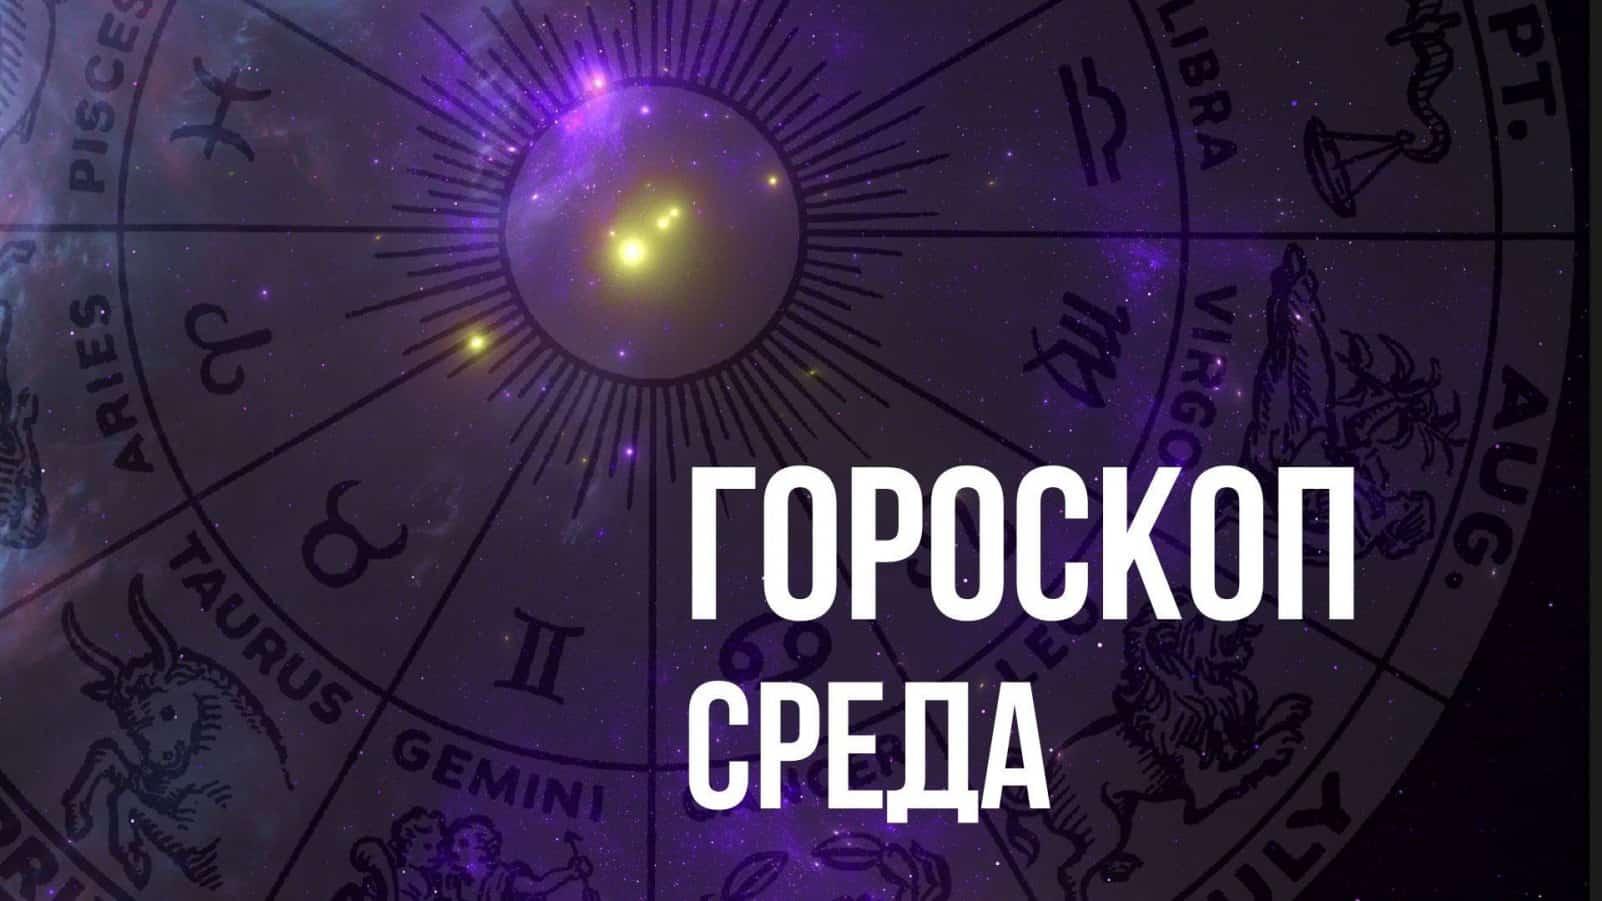 Гороскоп на среду 1 сентября для каждого знака Зодиака